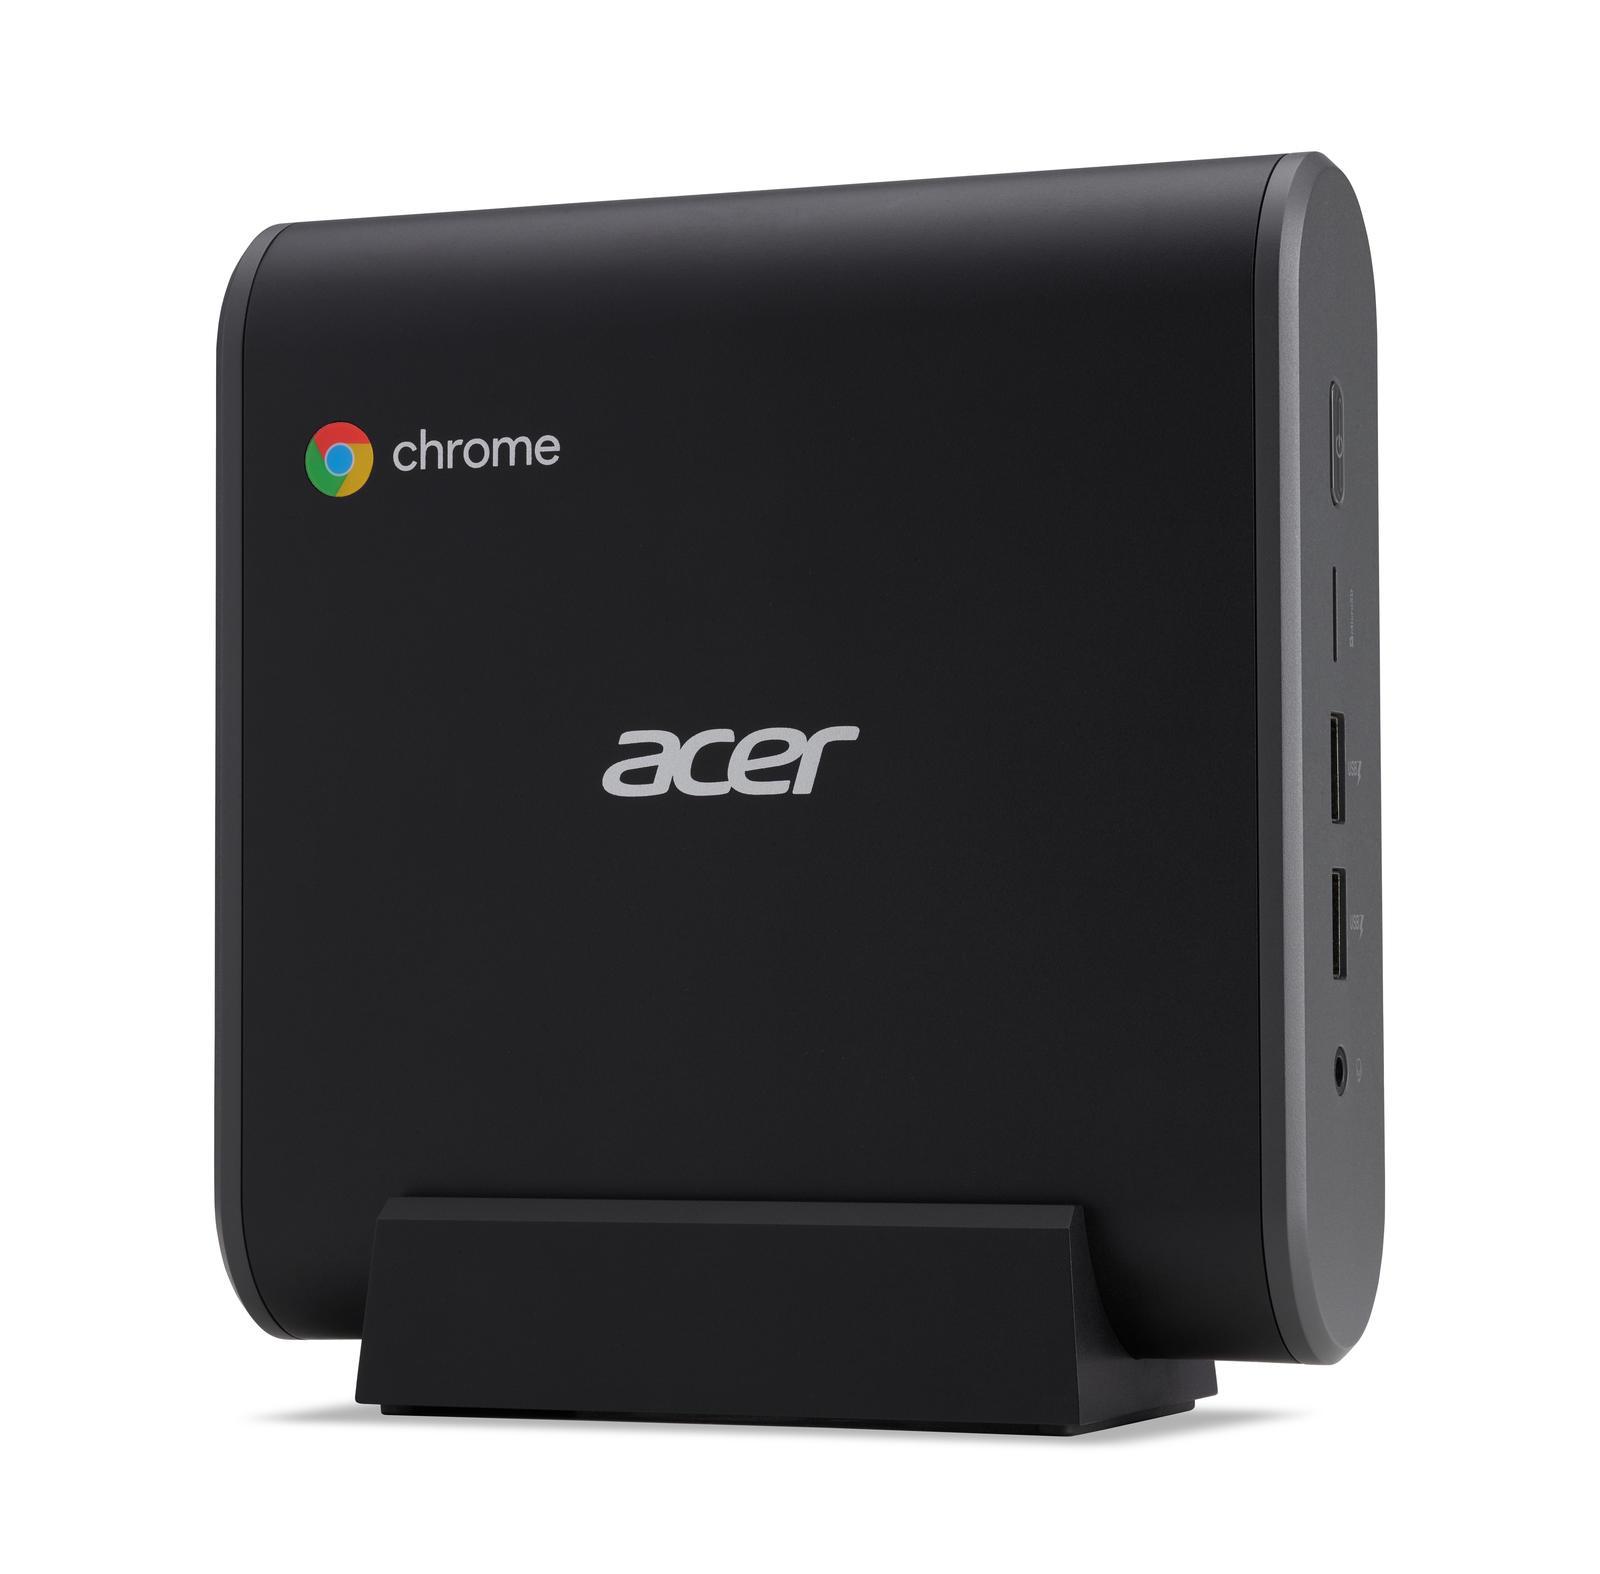 Acer Chromebox CXI3 Mini-PC Intel Core i3-8130U, 8GB RAM, 64GB SSD, Intel HD620 Grafik, Google Chrome OS dators